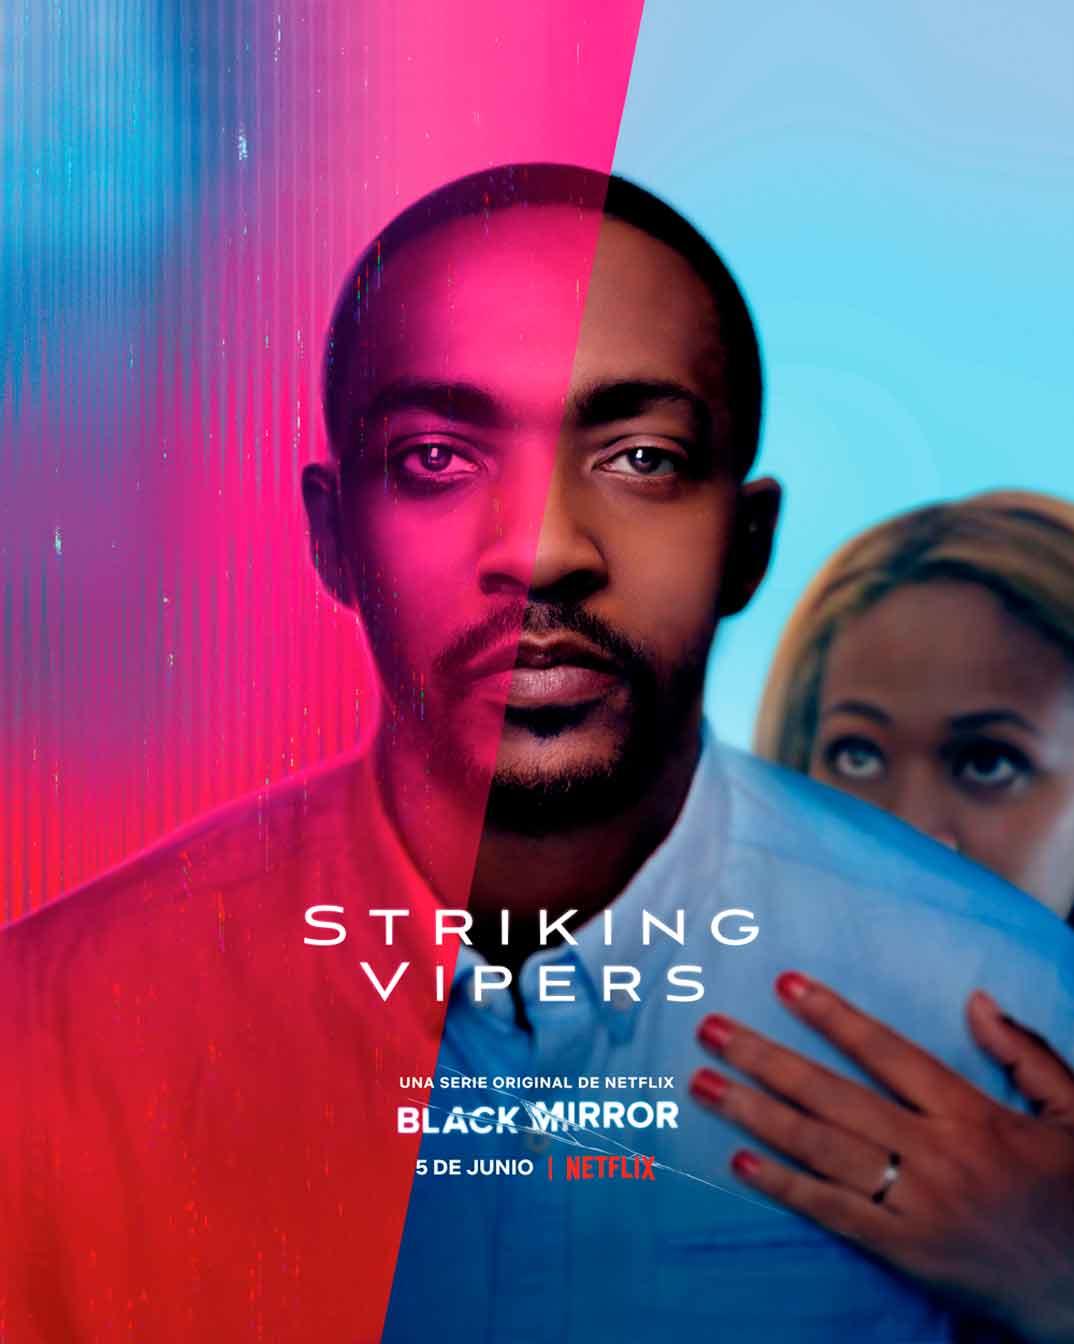 Striking Vipers - Black Mirror © Netflix